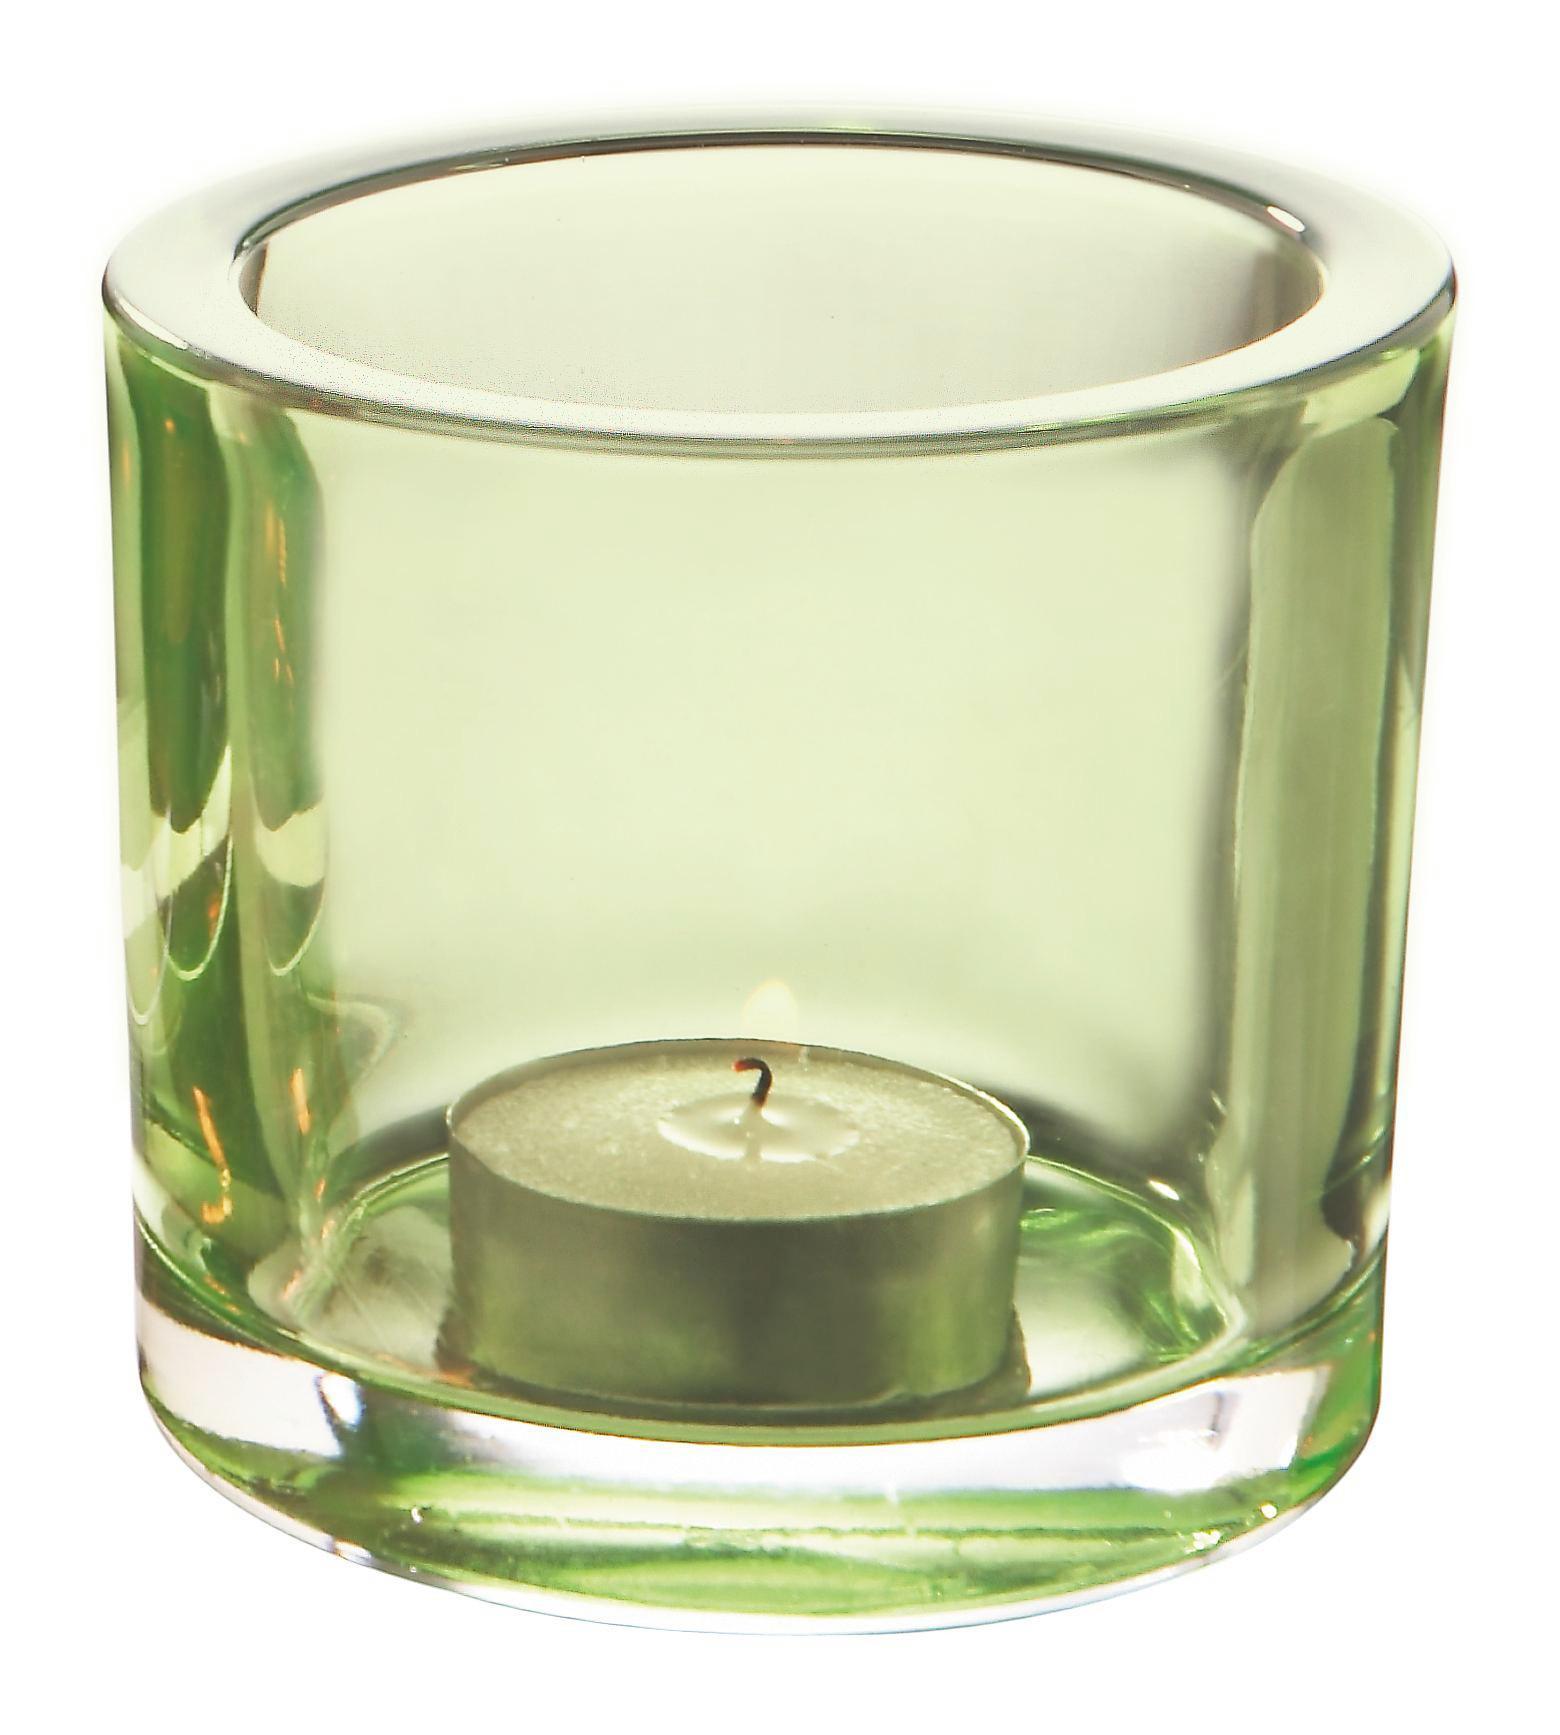 Držalo Za Čajno Svečko Silke - črna/siva, Moderno, steklo (9/8cm) - MÖMAX modern living